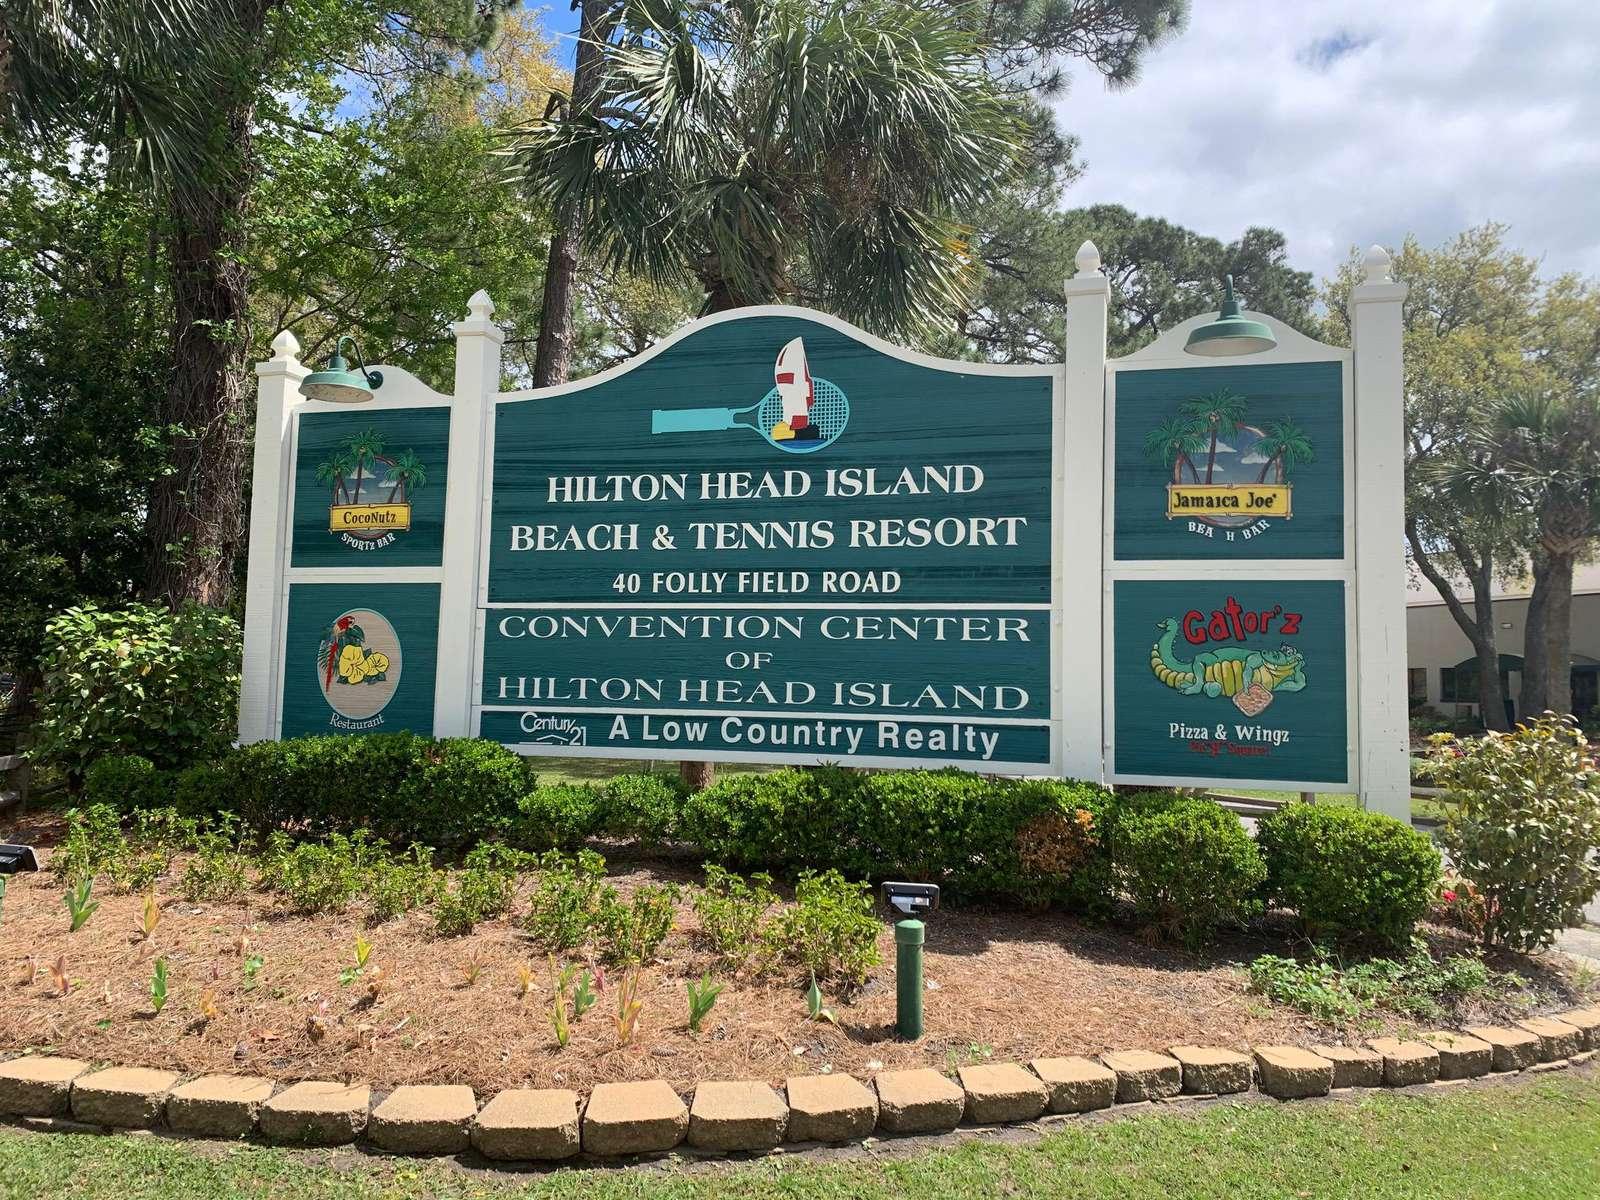 Entrance into Resort